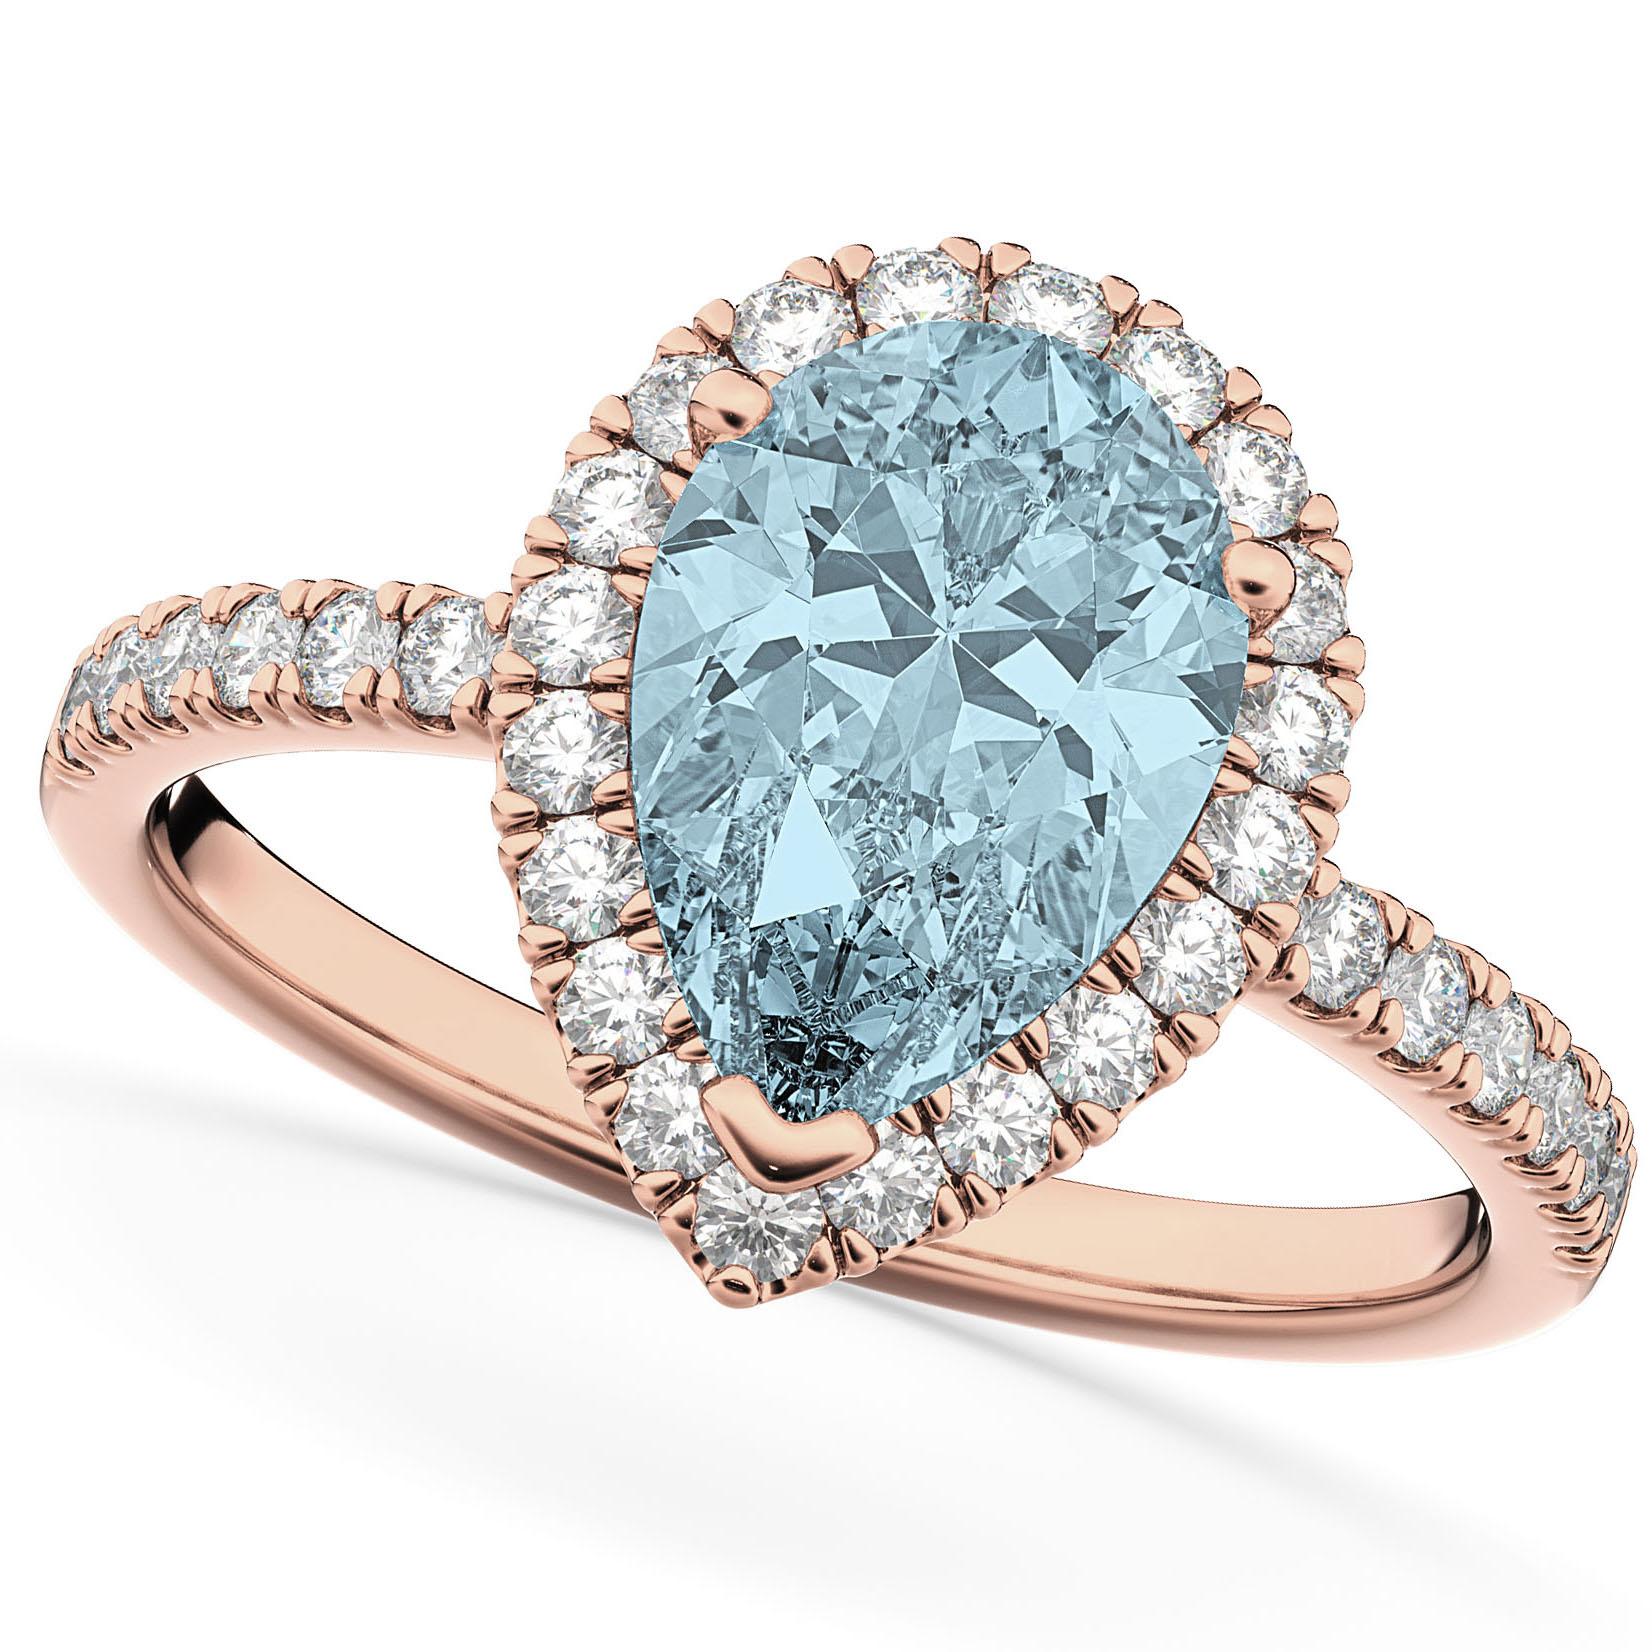 Pear Cut Halo Aquamarine & Diamond Engagement Ring 14K Rose Gold 2.36ct